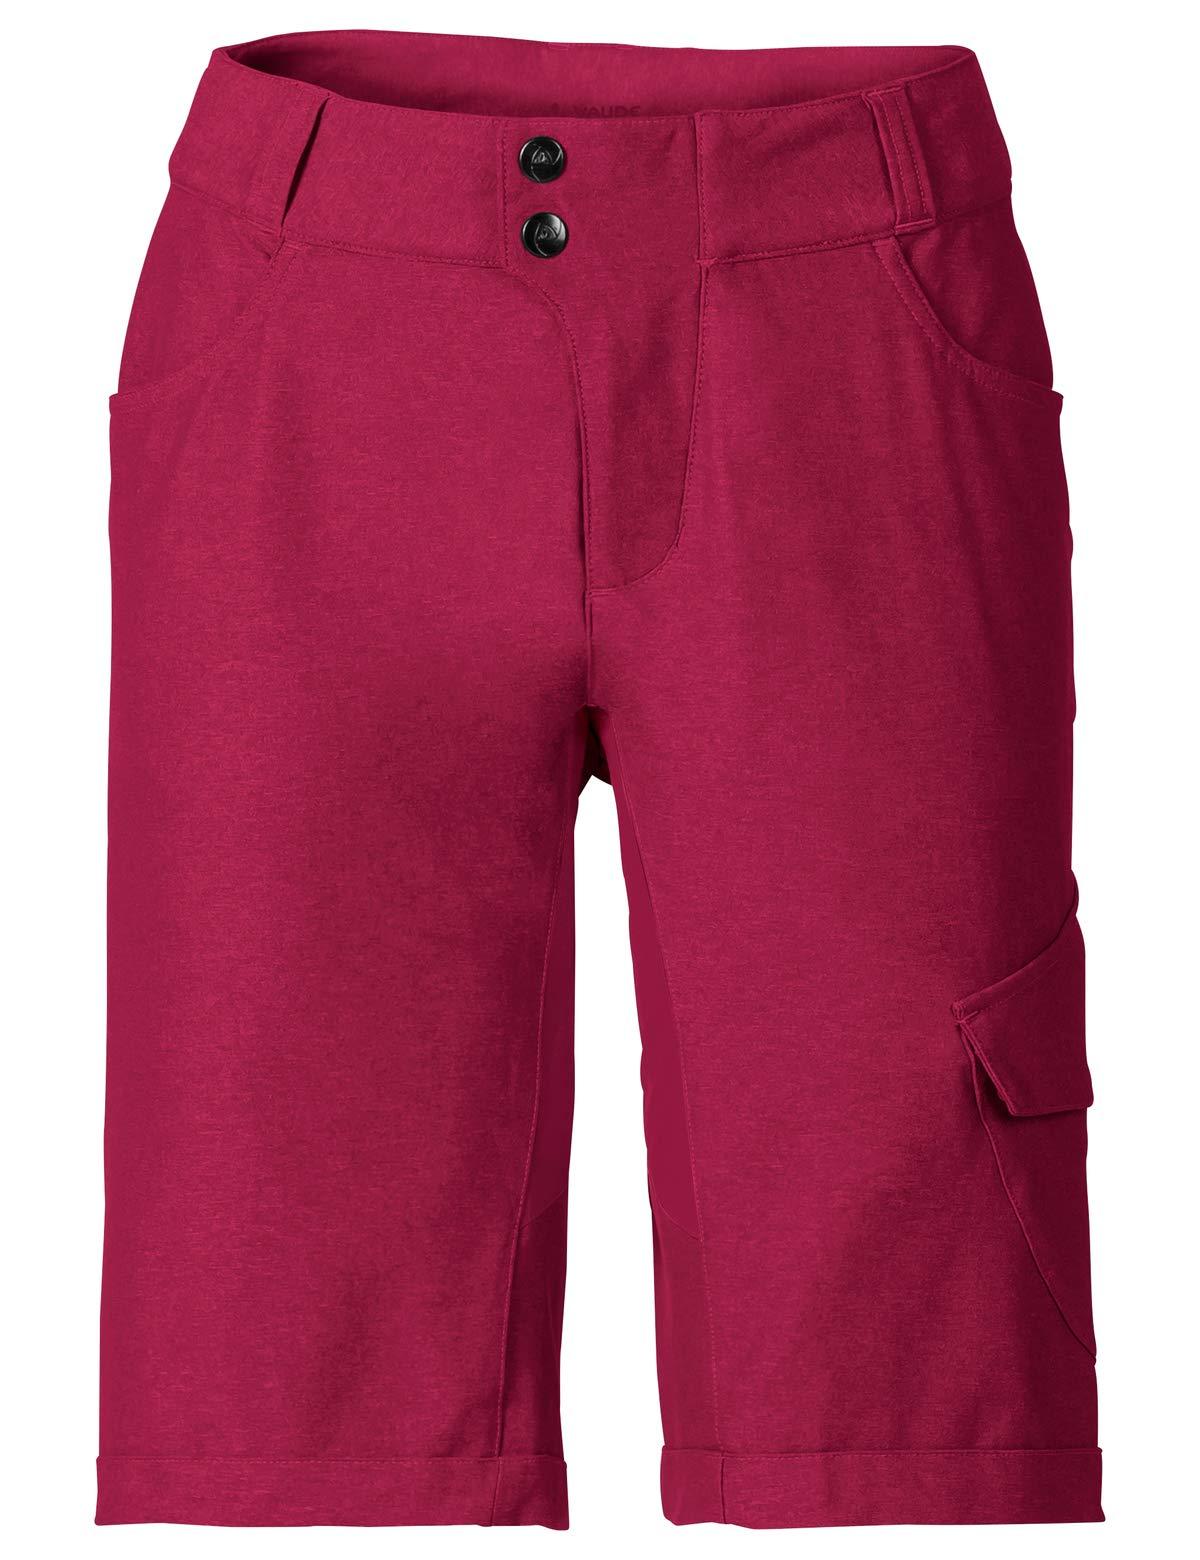 VAUDE Damen Hose Tremalzo Shorts II, crimson red, 42, 405079770420